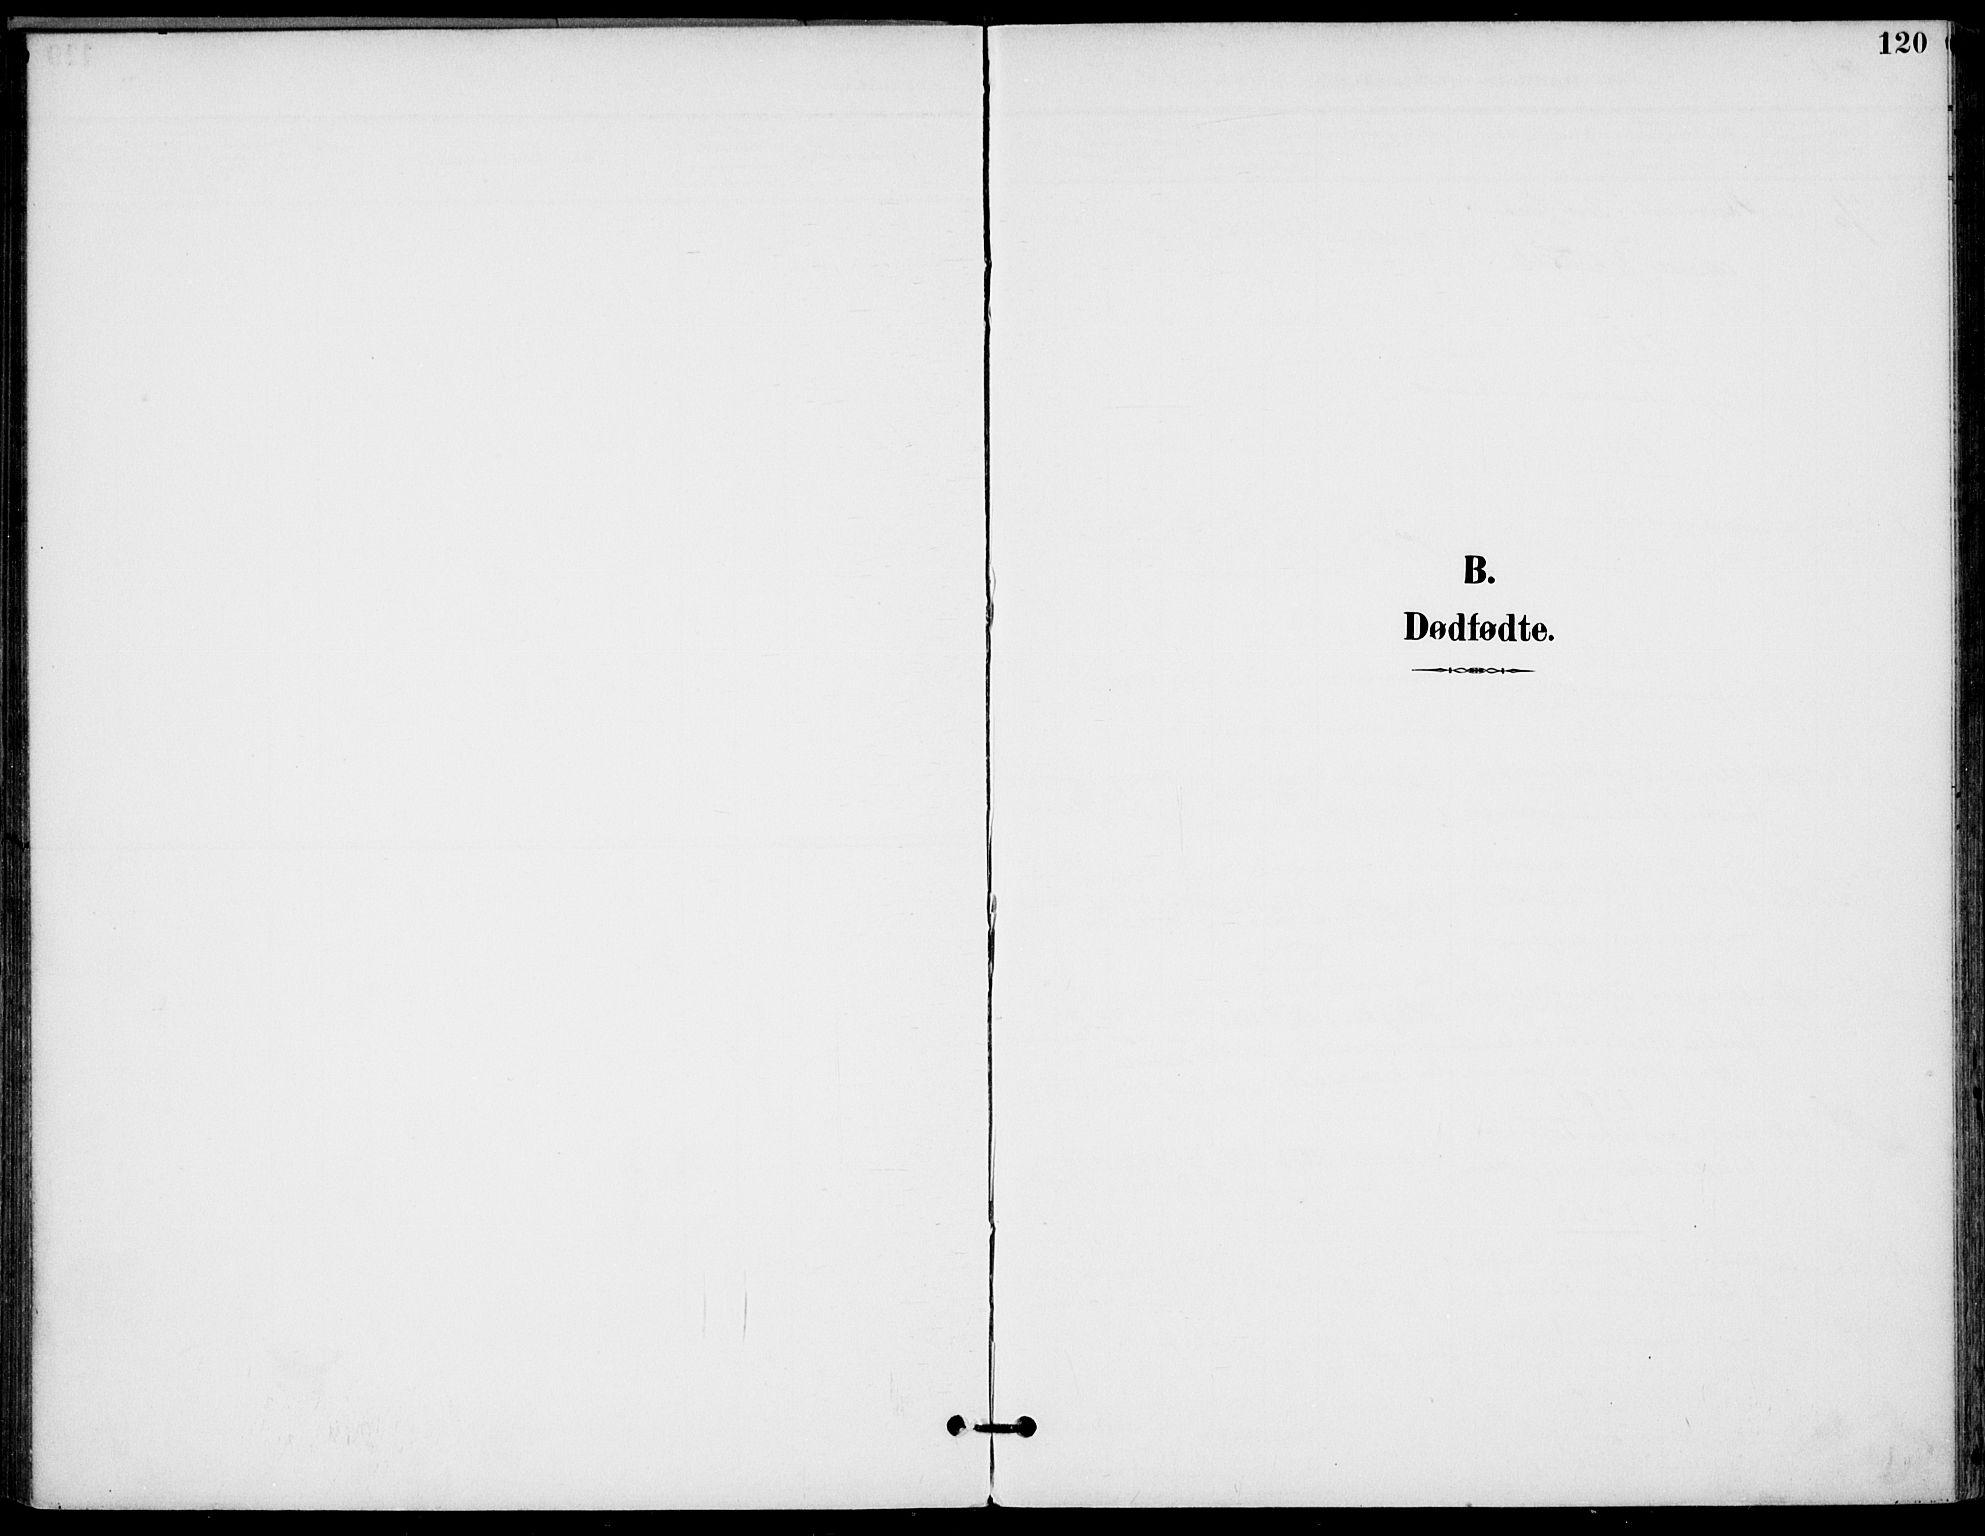 SAKO, Drangedal kirkebøker, F/Fa/L0012: Ministerialbok nr. 12, 1895-1905, s. 120